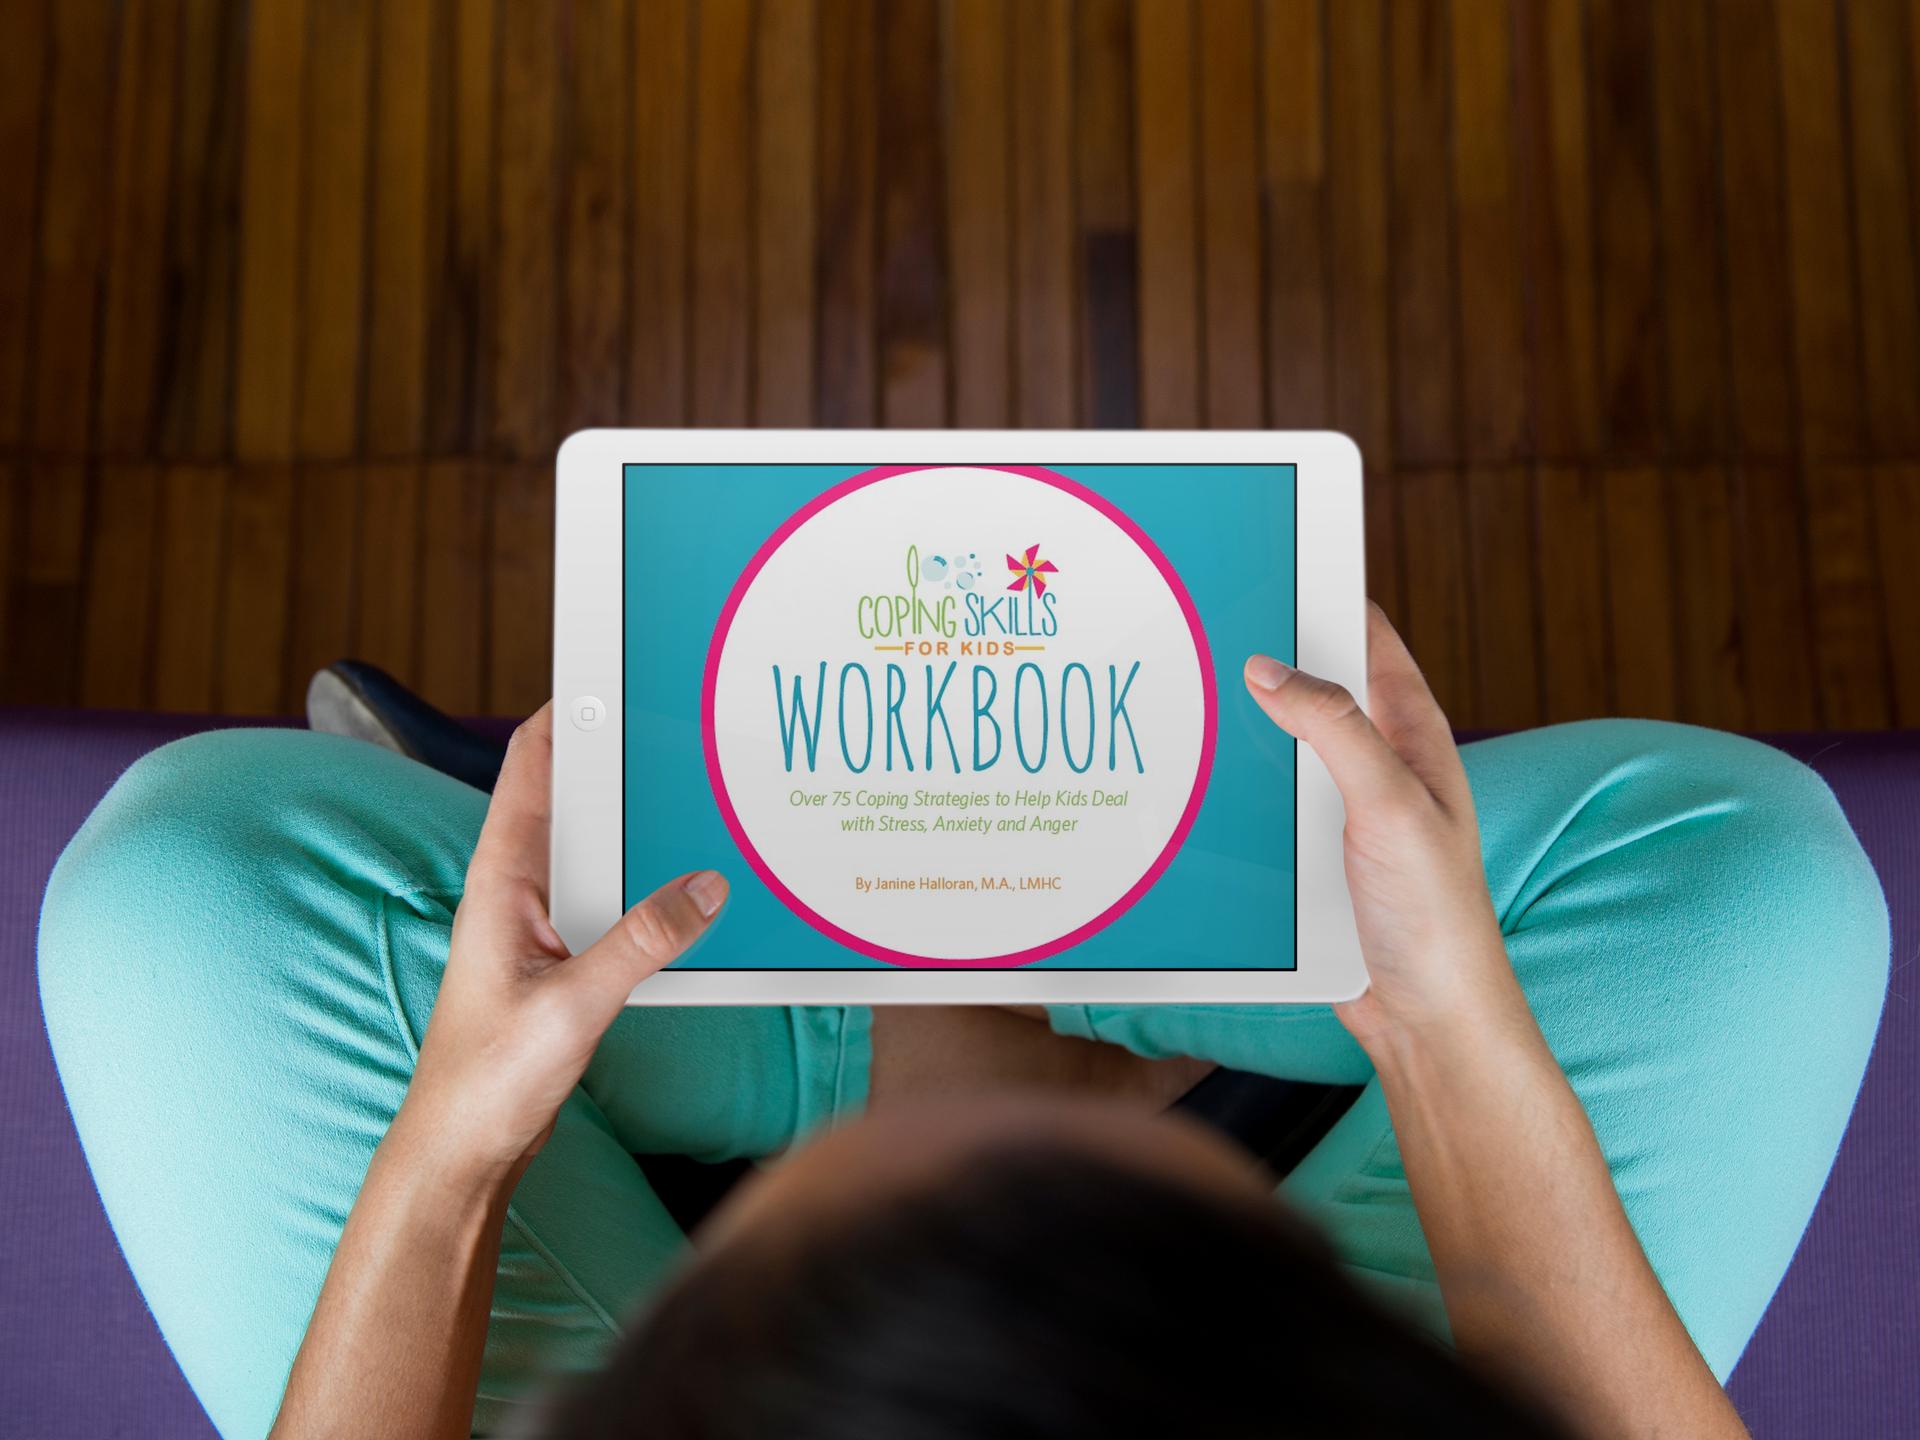 Coping Skills for Kids Workbook Image.jpg